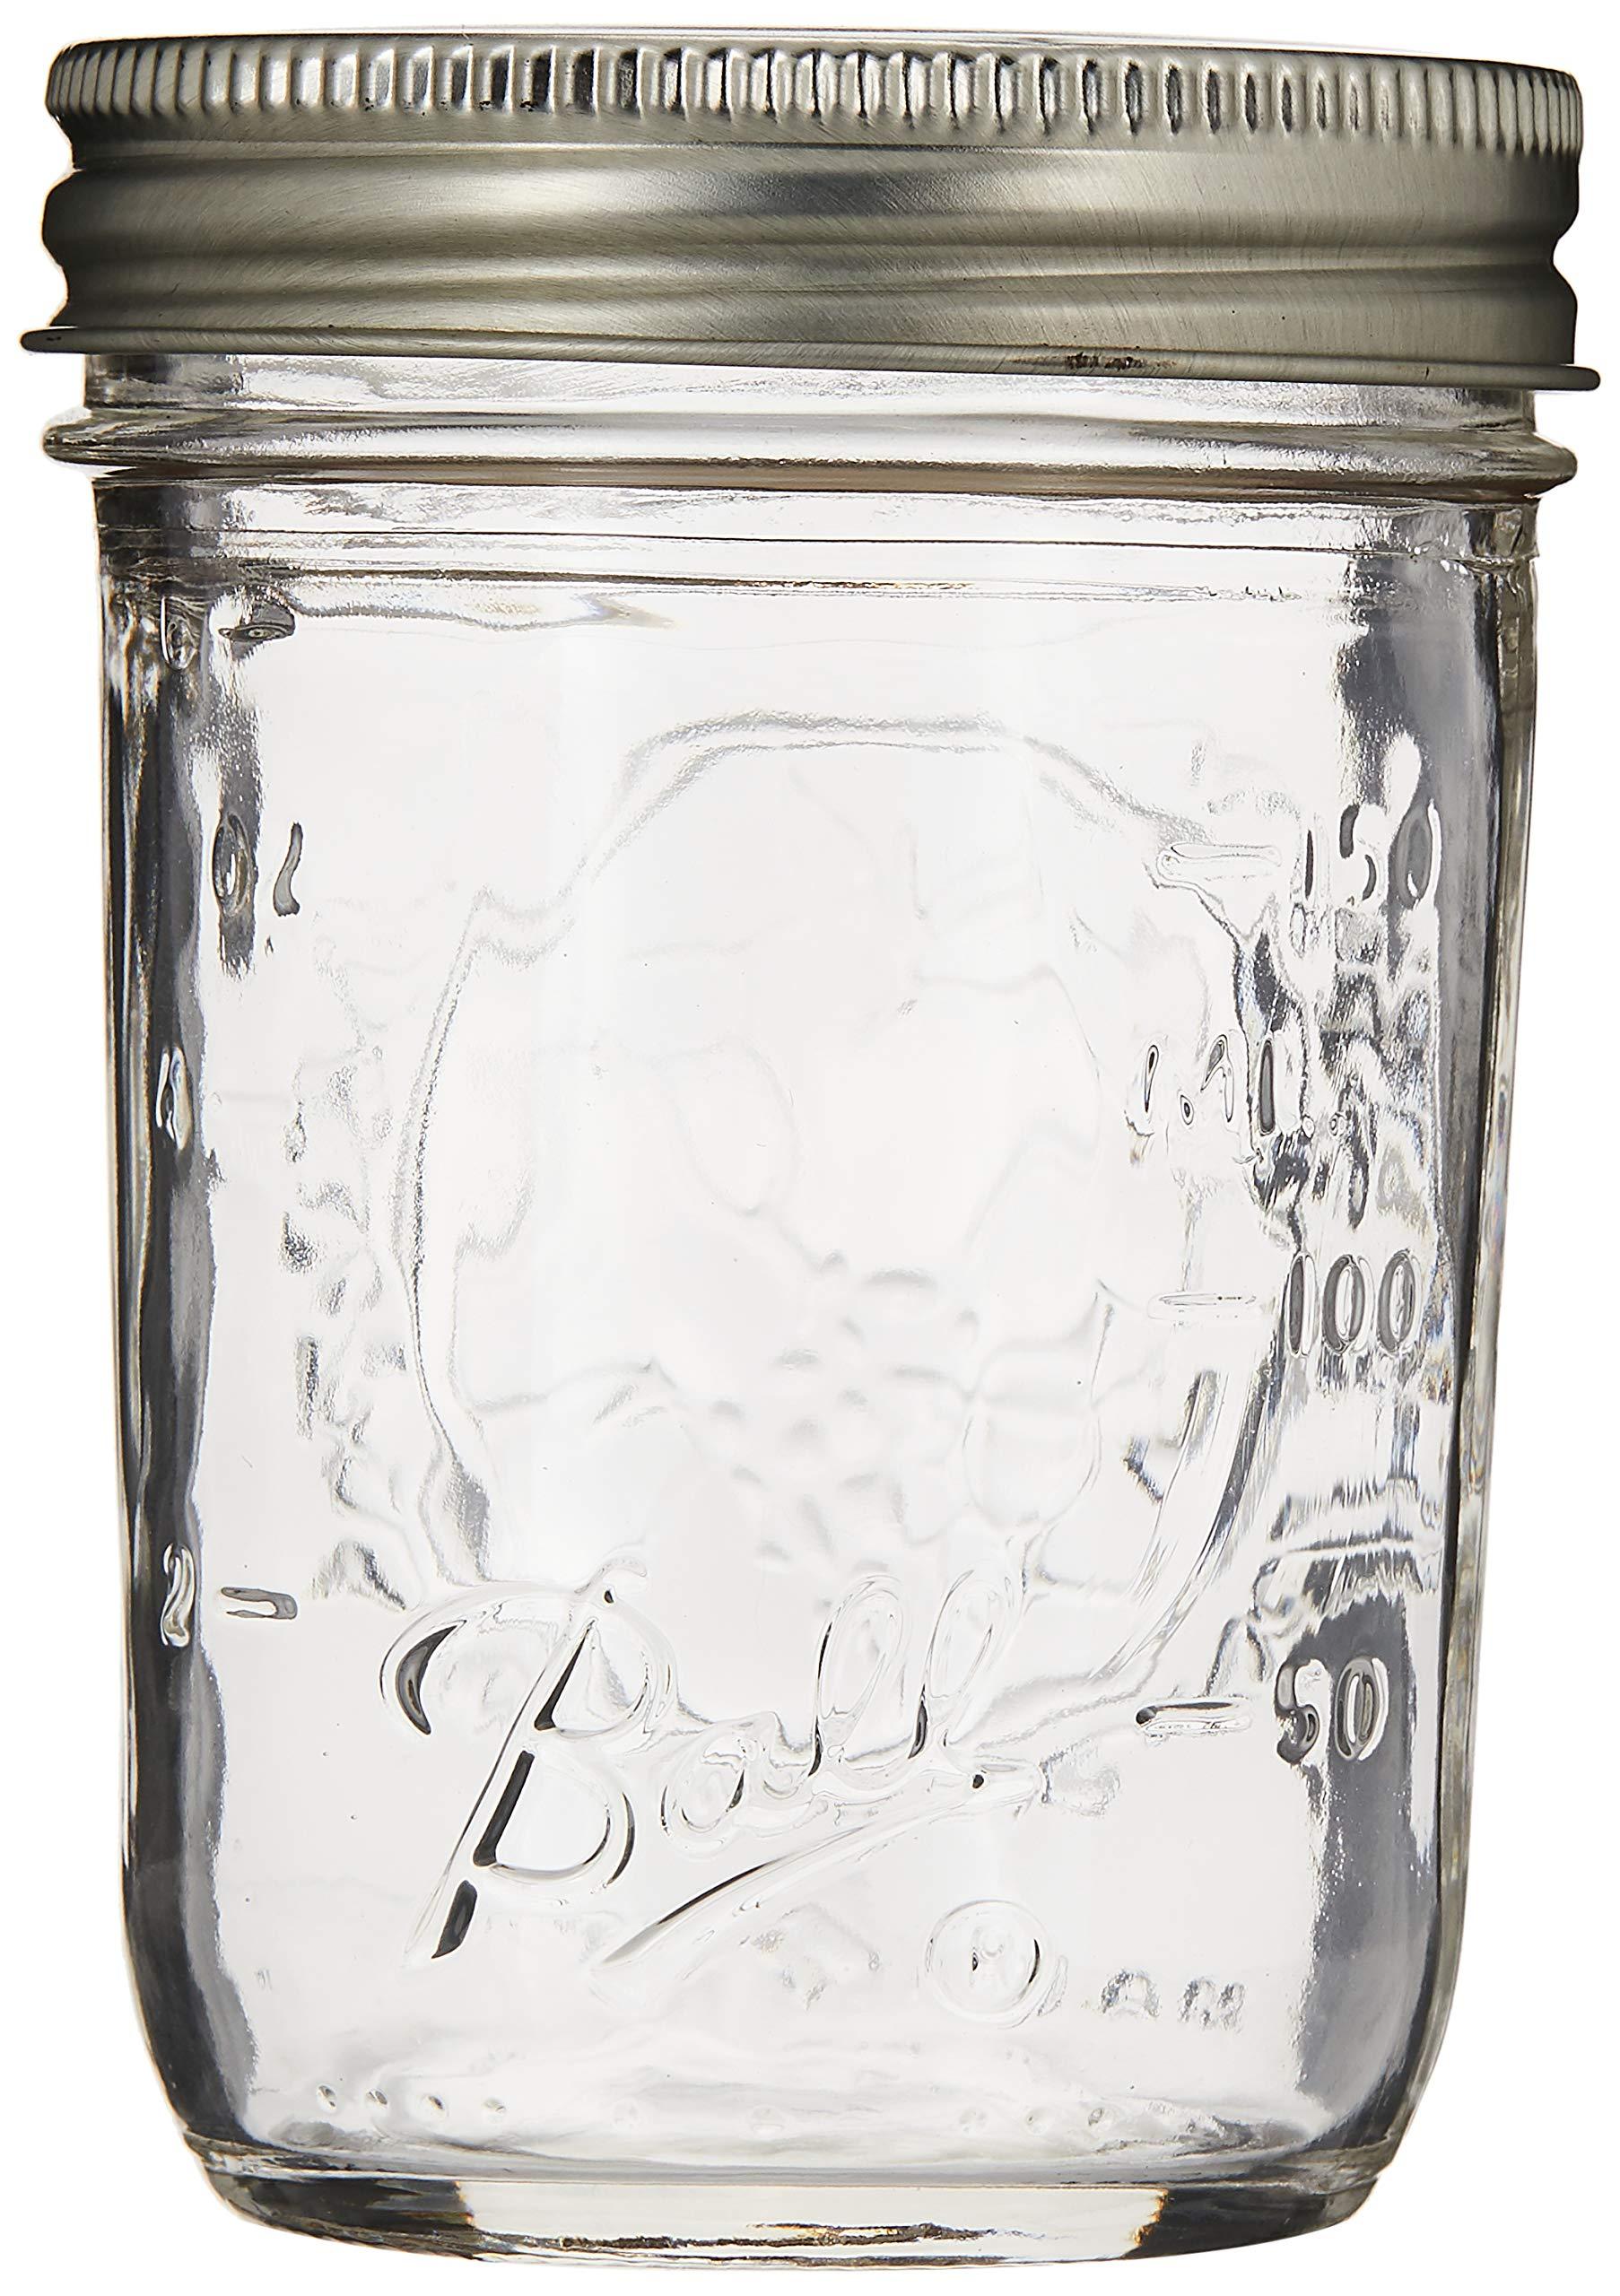 Ball Half Pint (8 oz.) Regular Mouth Mason Jars w/ Cap - Set of 12 AEP